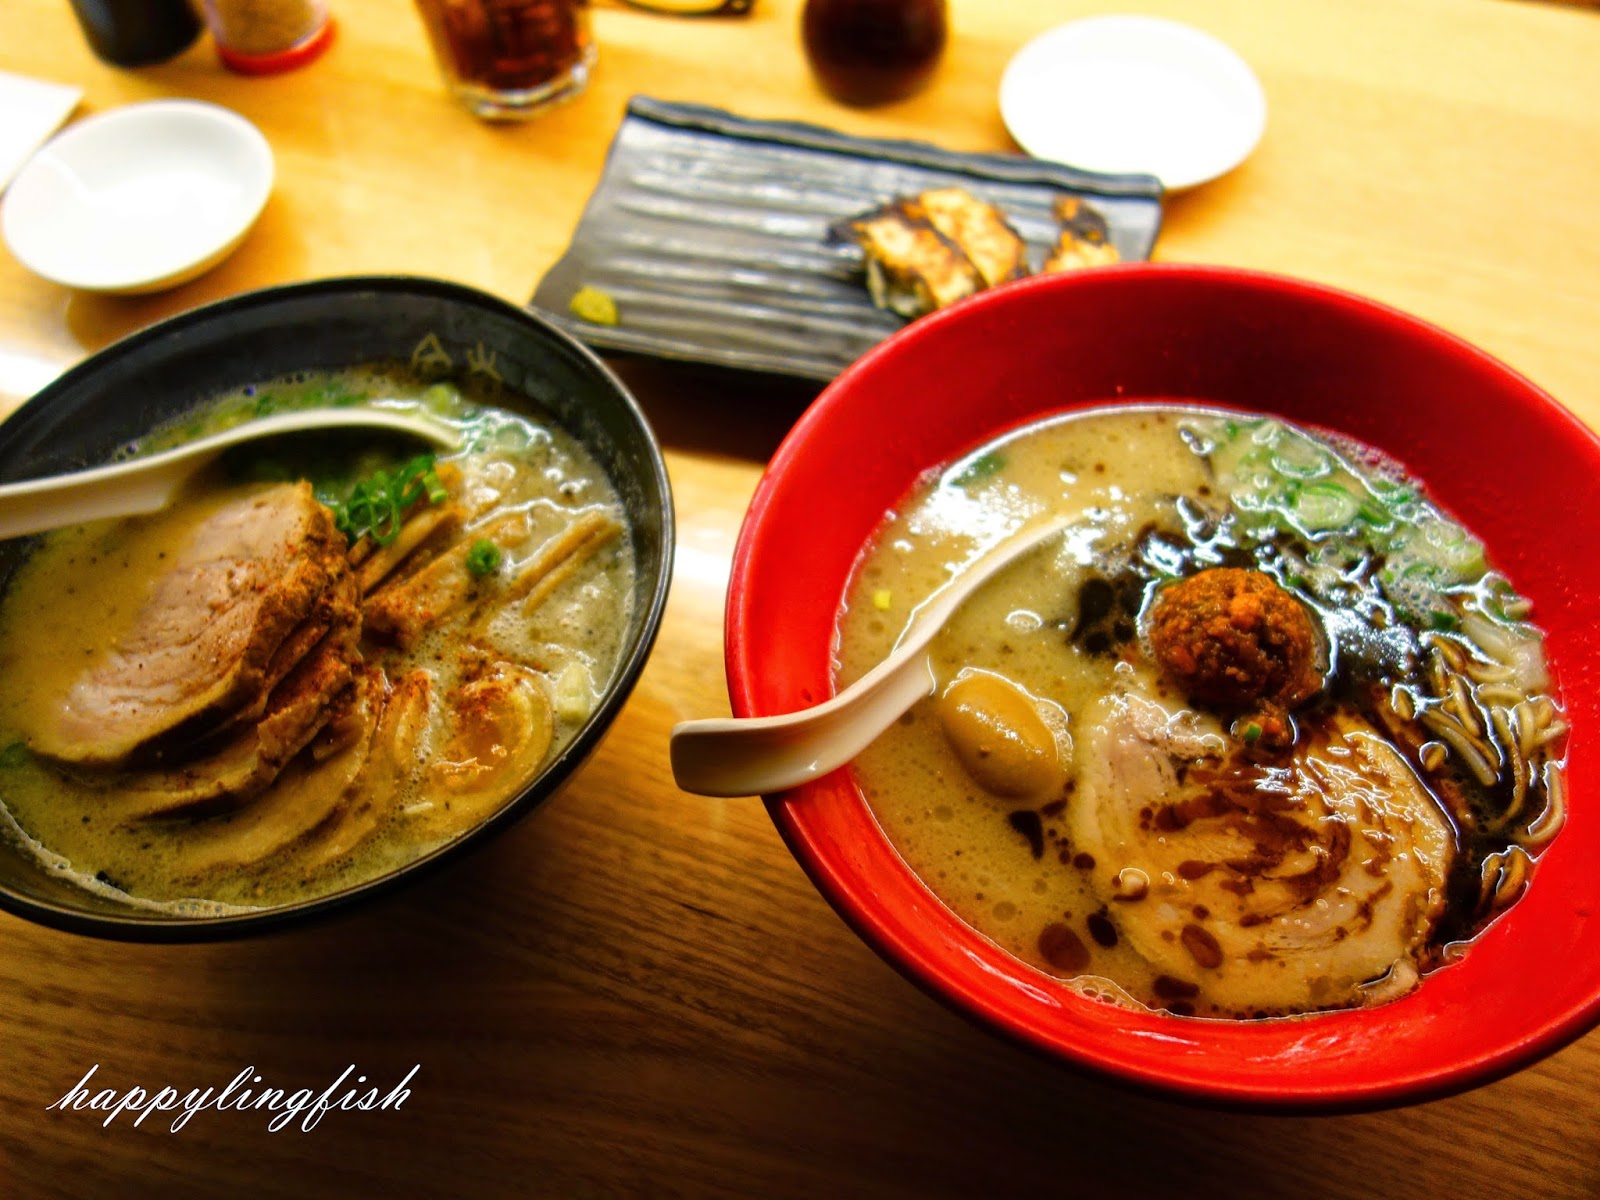 Happy Lingfish ♥ : Noobie Foodie│Ippudo Ramen Sydney within Ippudo $10 Ramen